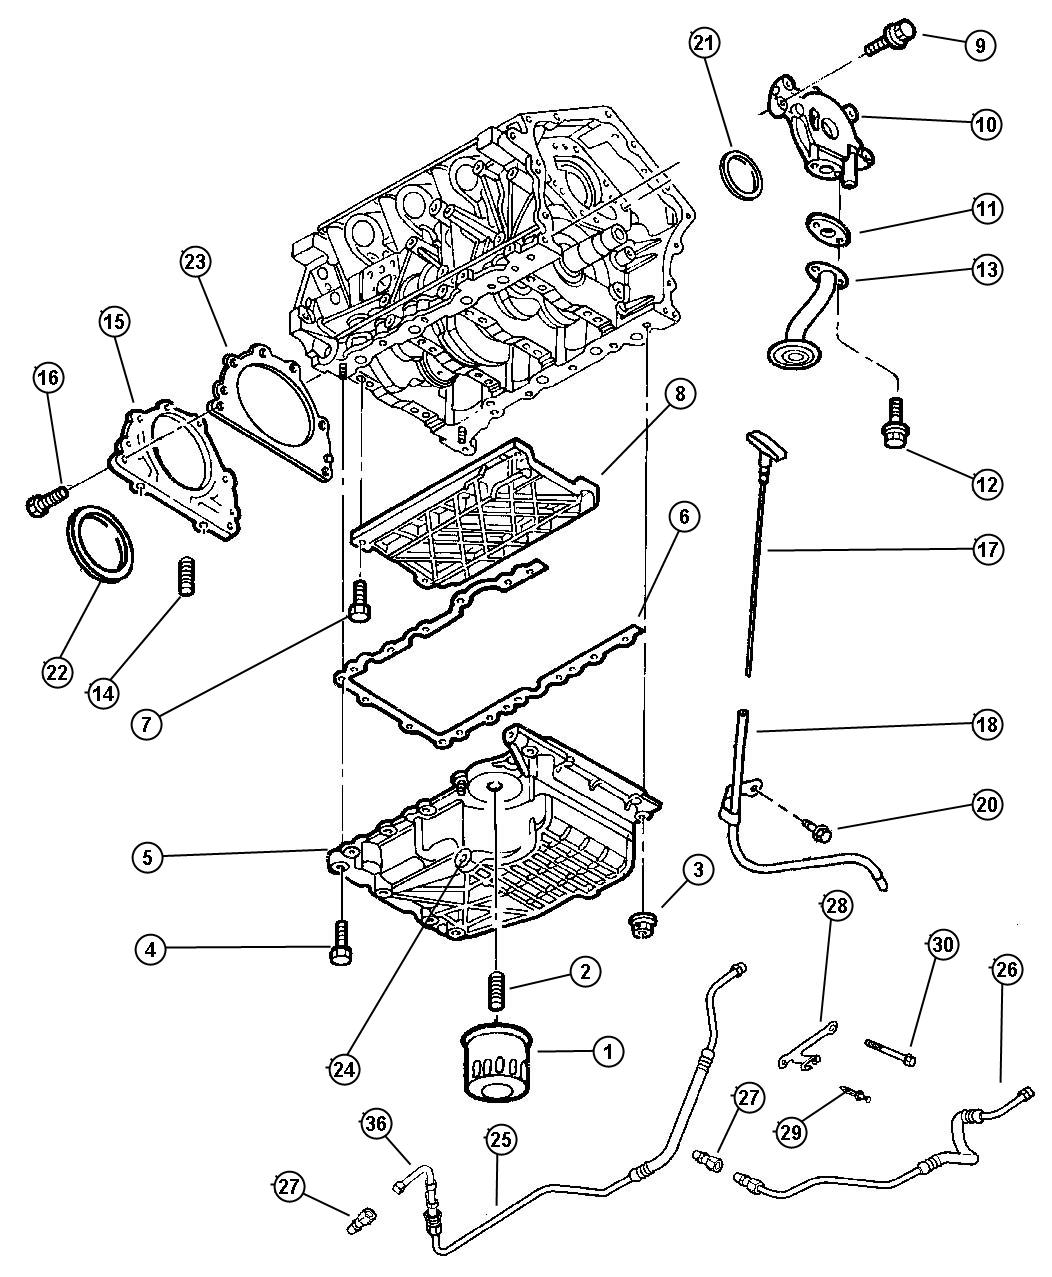 Chrysler 300 Spring Oil Pressure Relief Valve Oil Pump